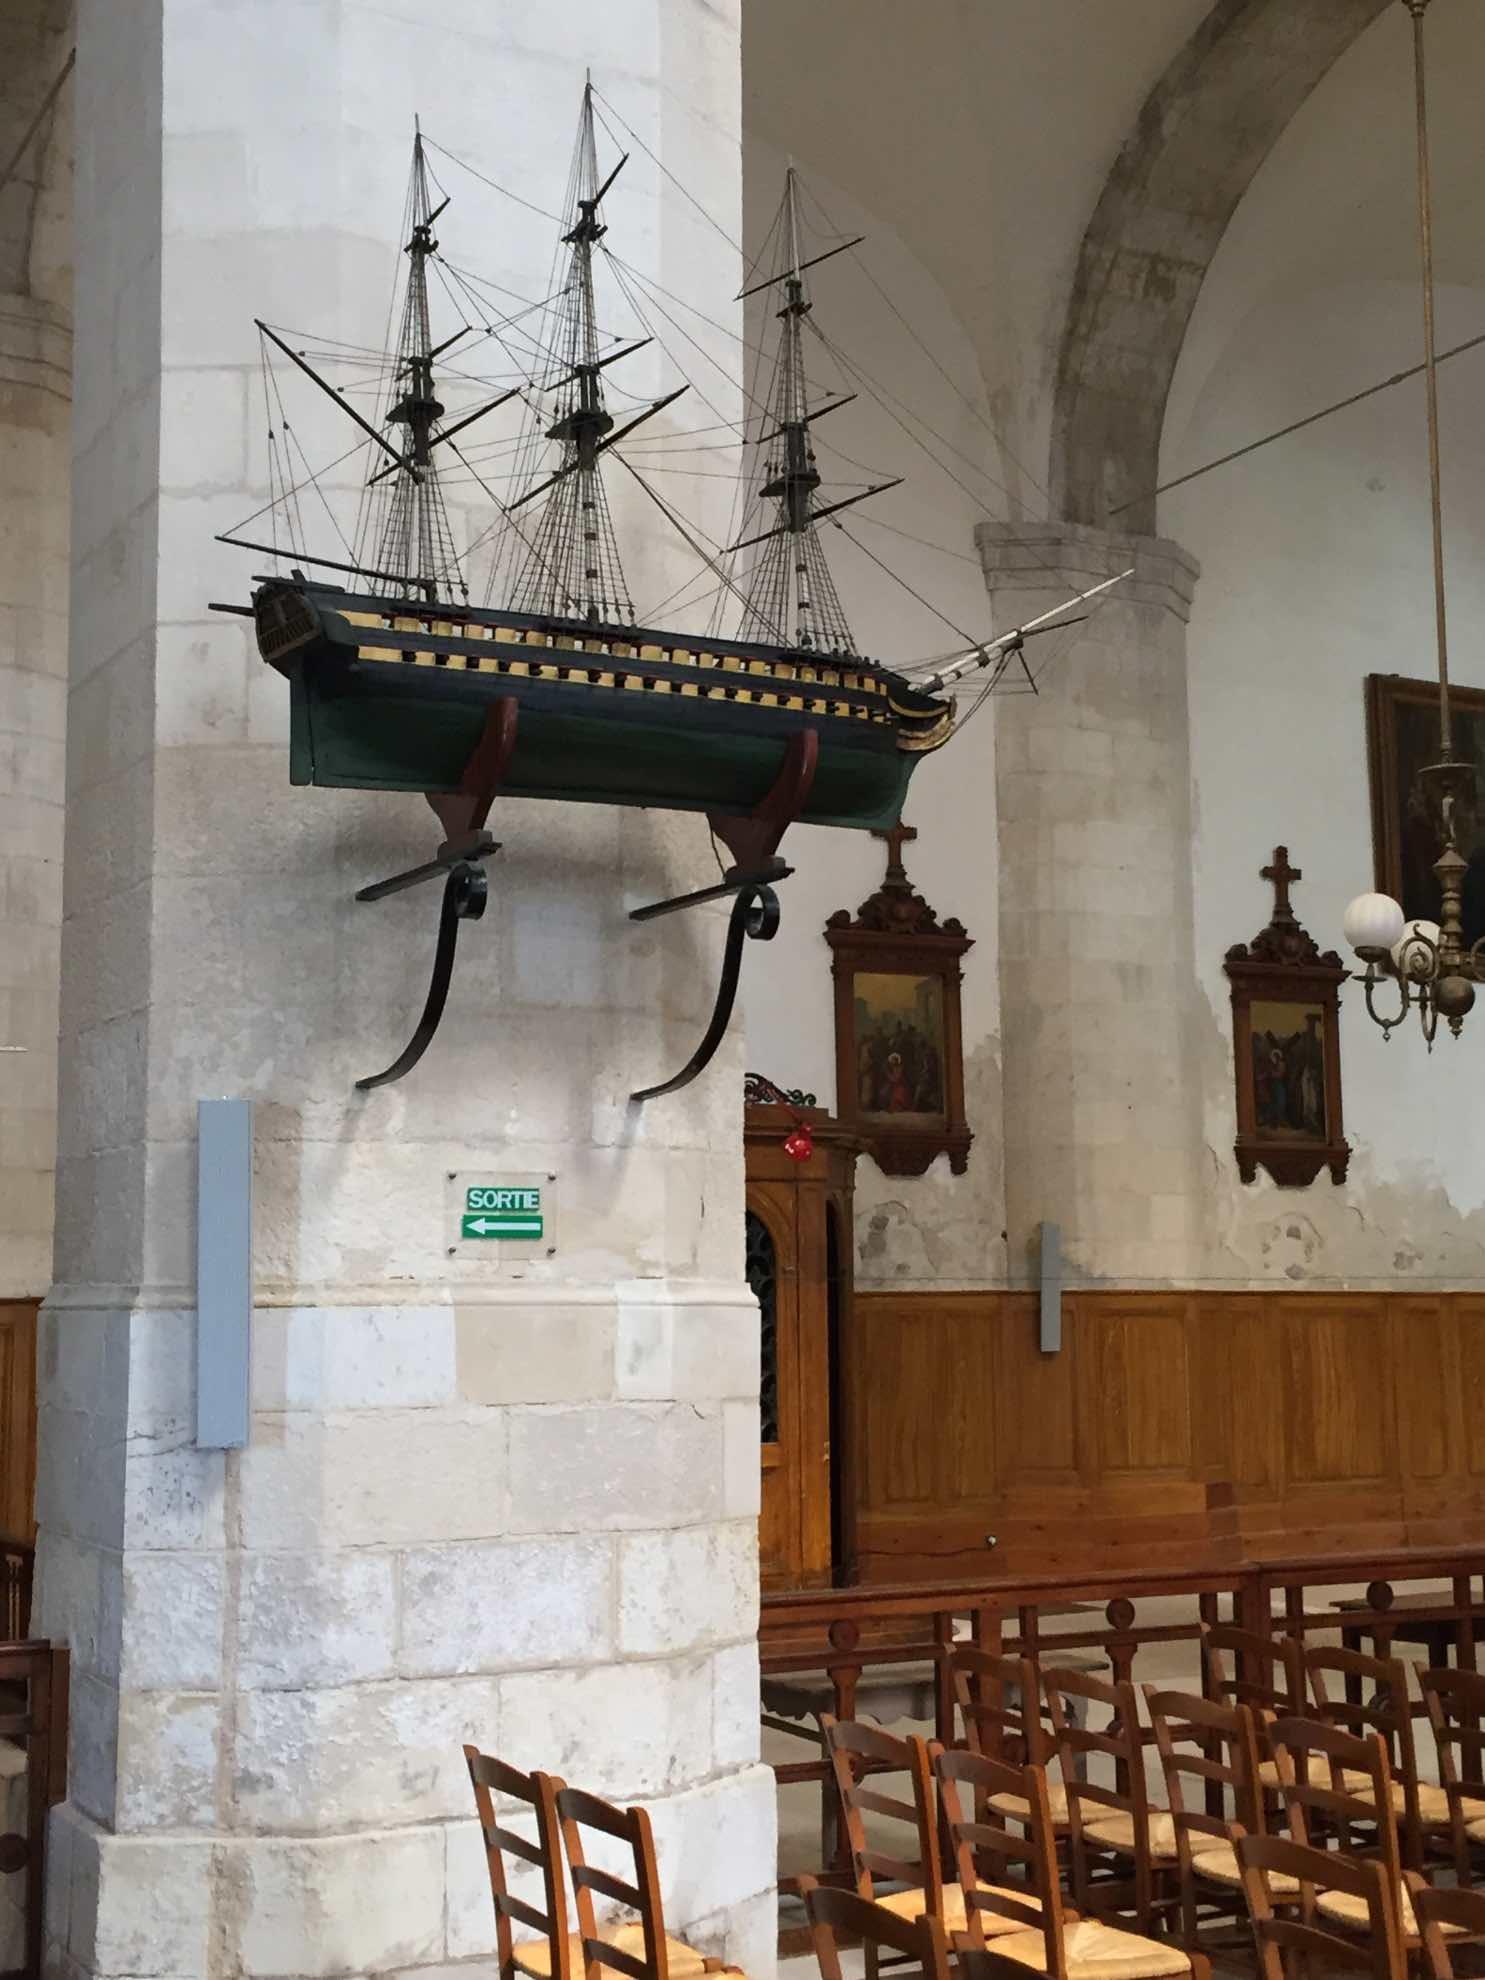 20160423-010-...-Sogar-in-der-Kirche.jpg